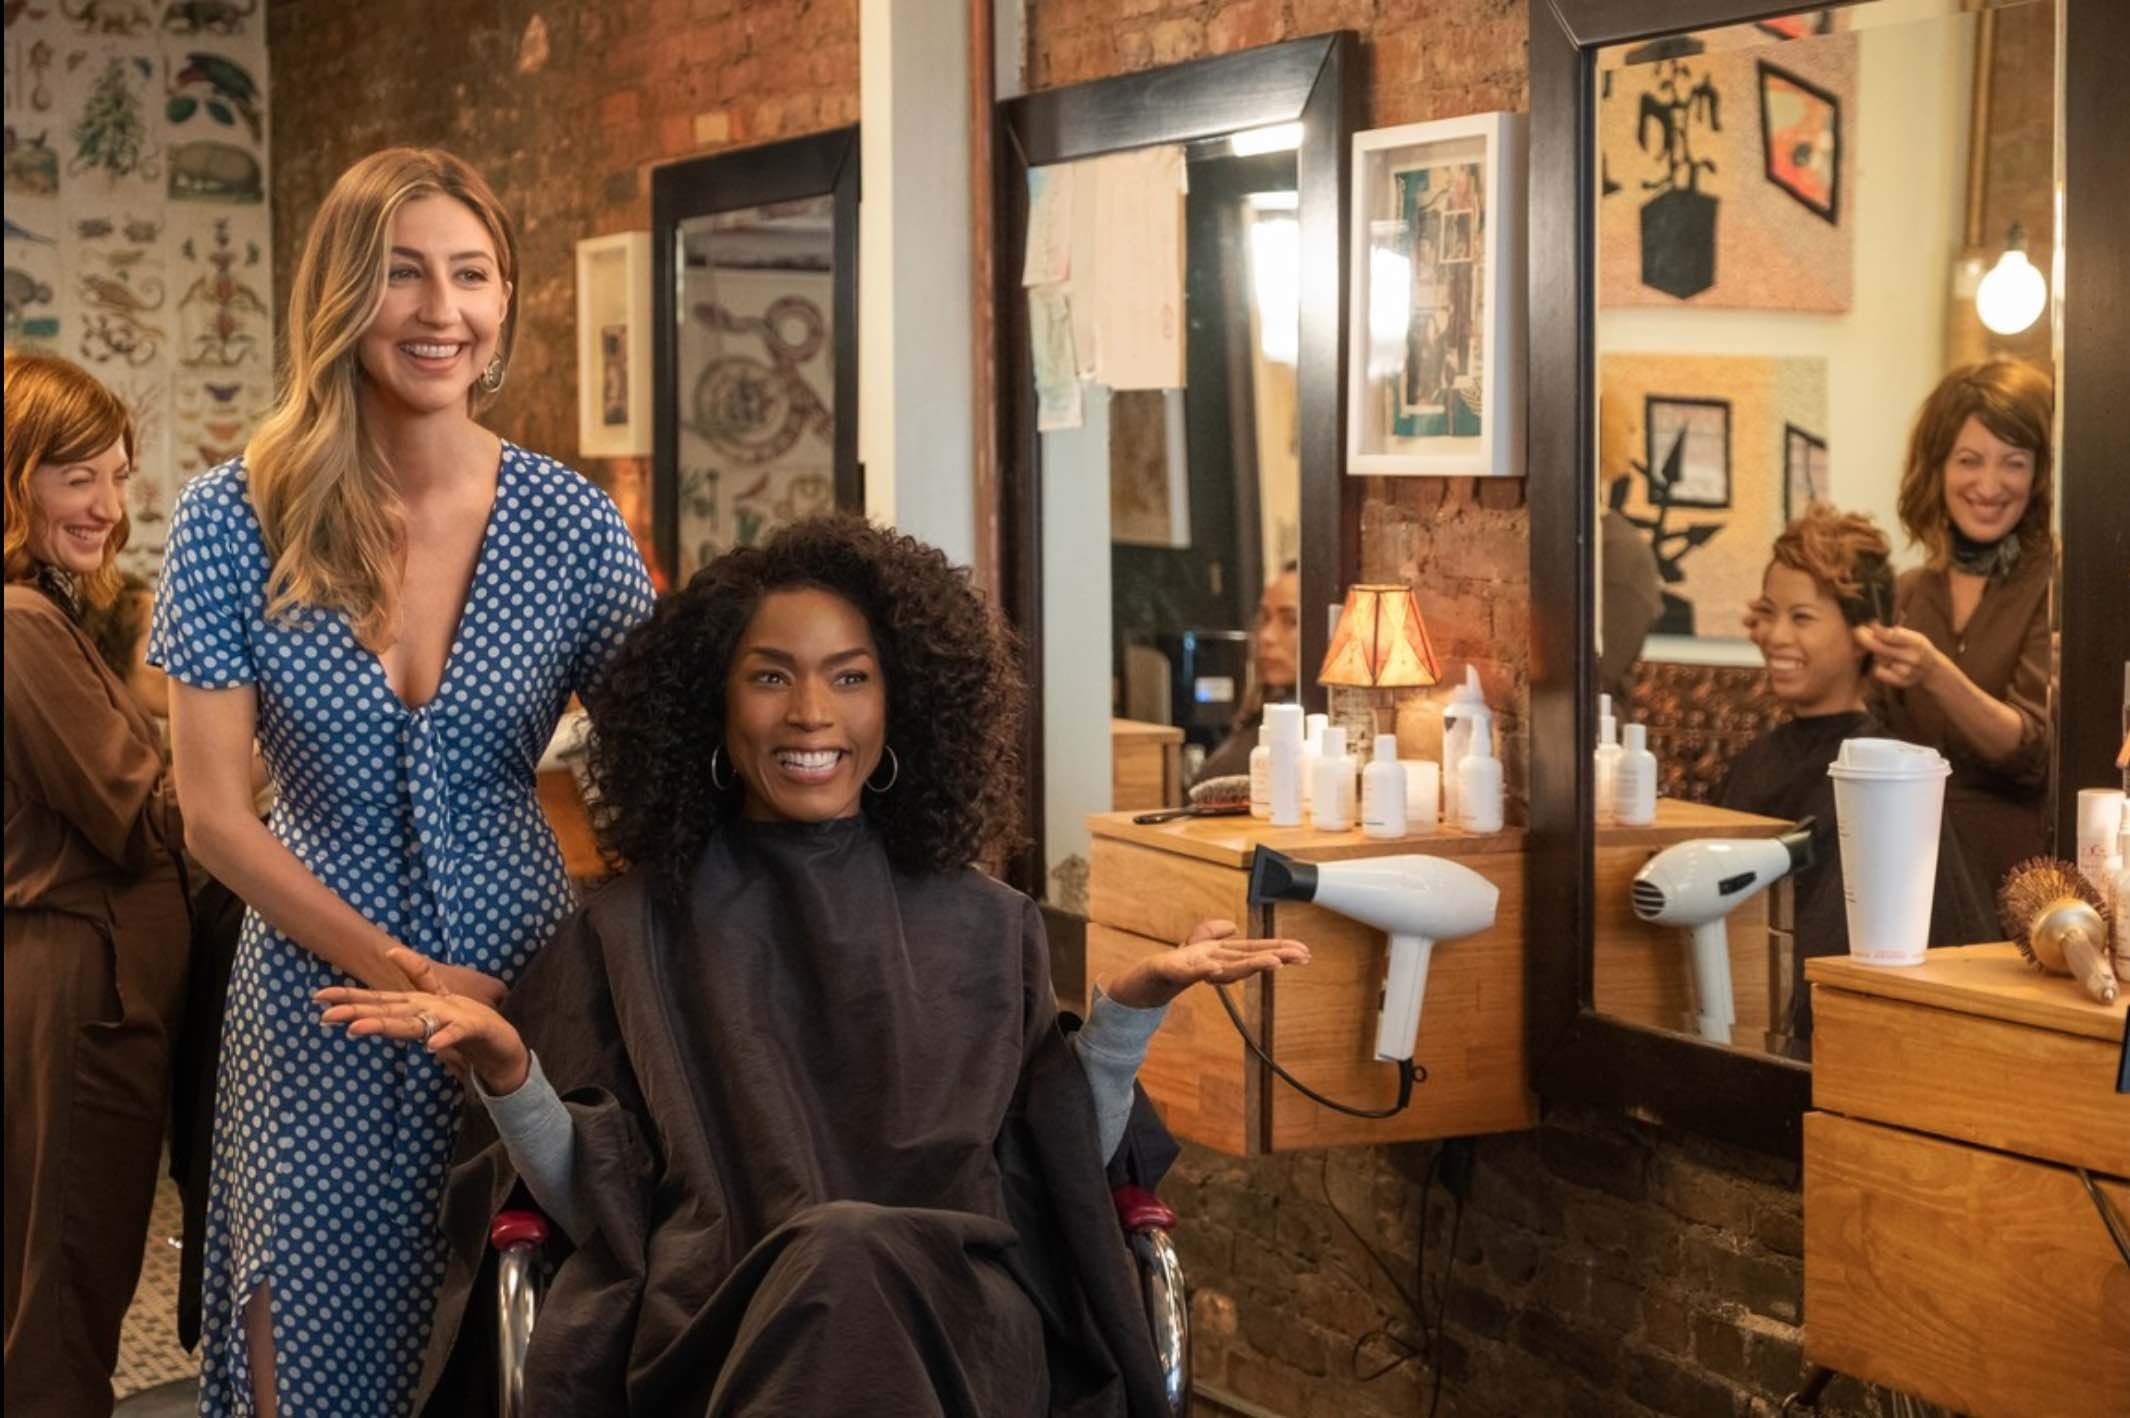 Pictured above: Fringe hair salon owner Amy Schiappa, Margarita Allen, Heidi Gardner, and Angela Bassett in  Otherhood